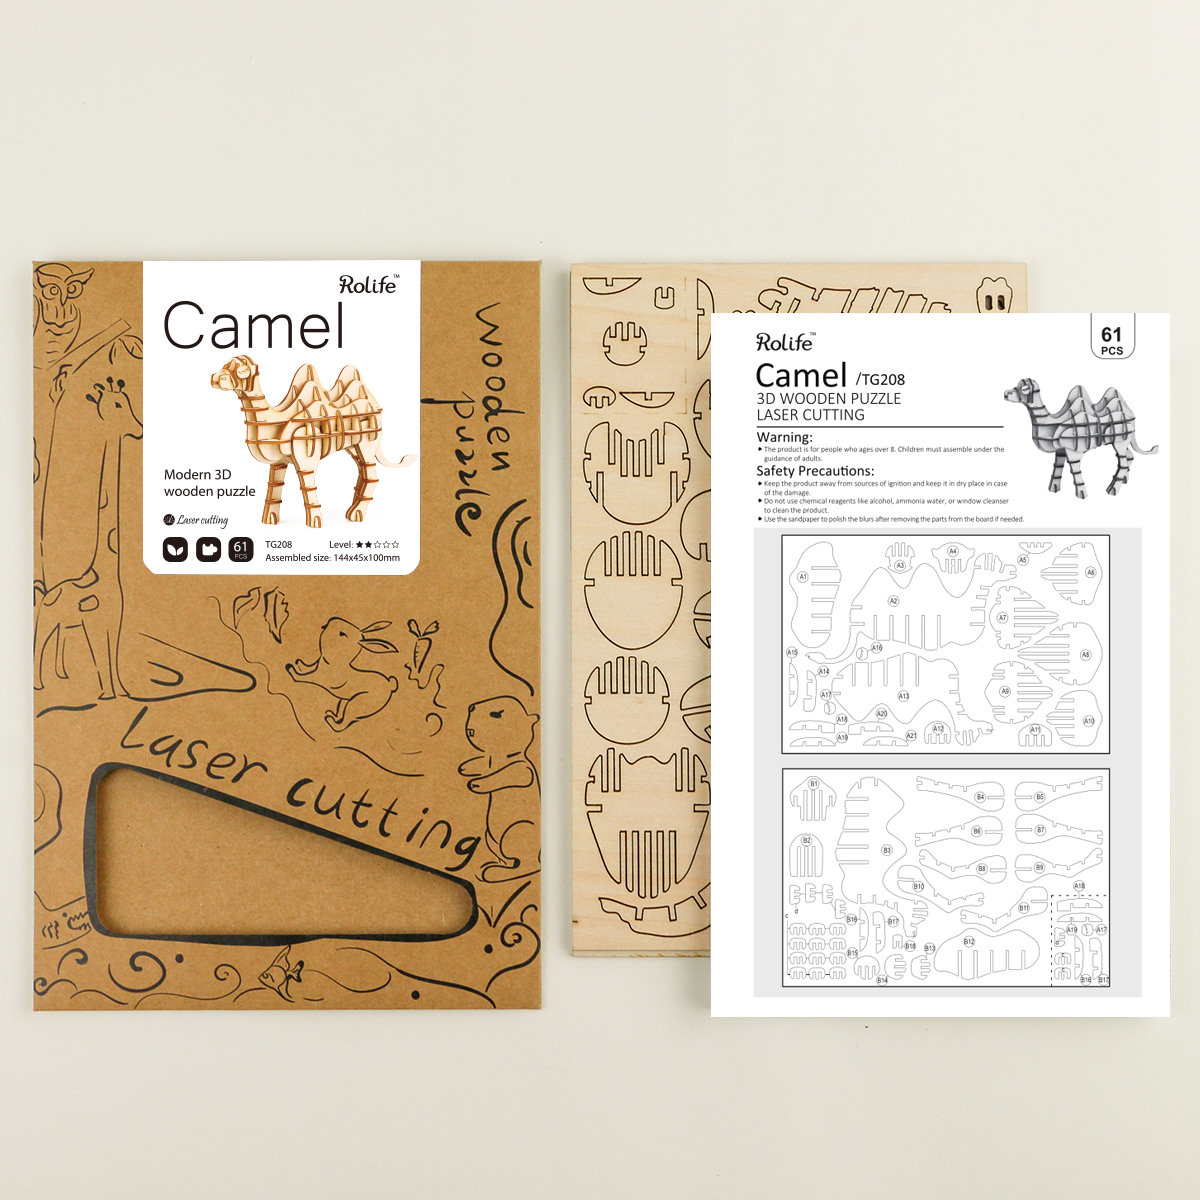 Camel TG208